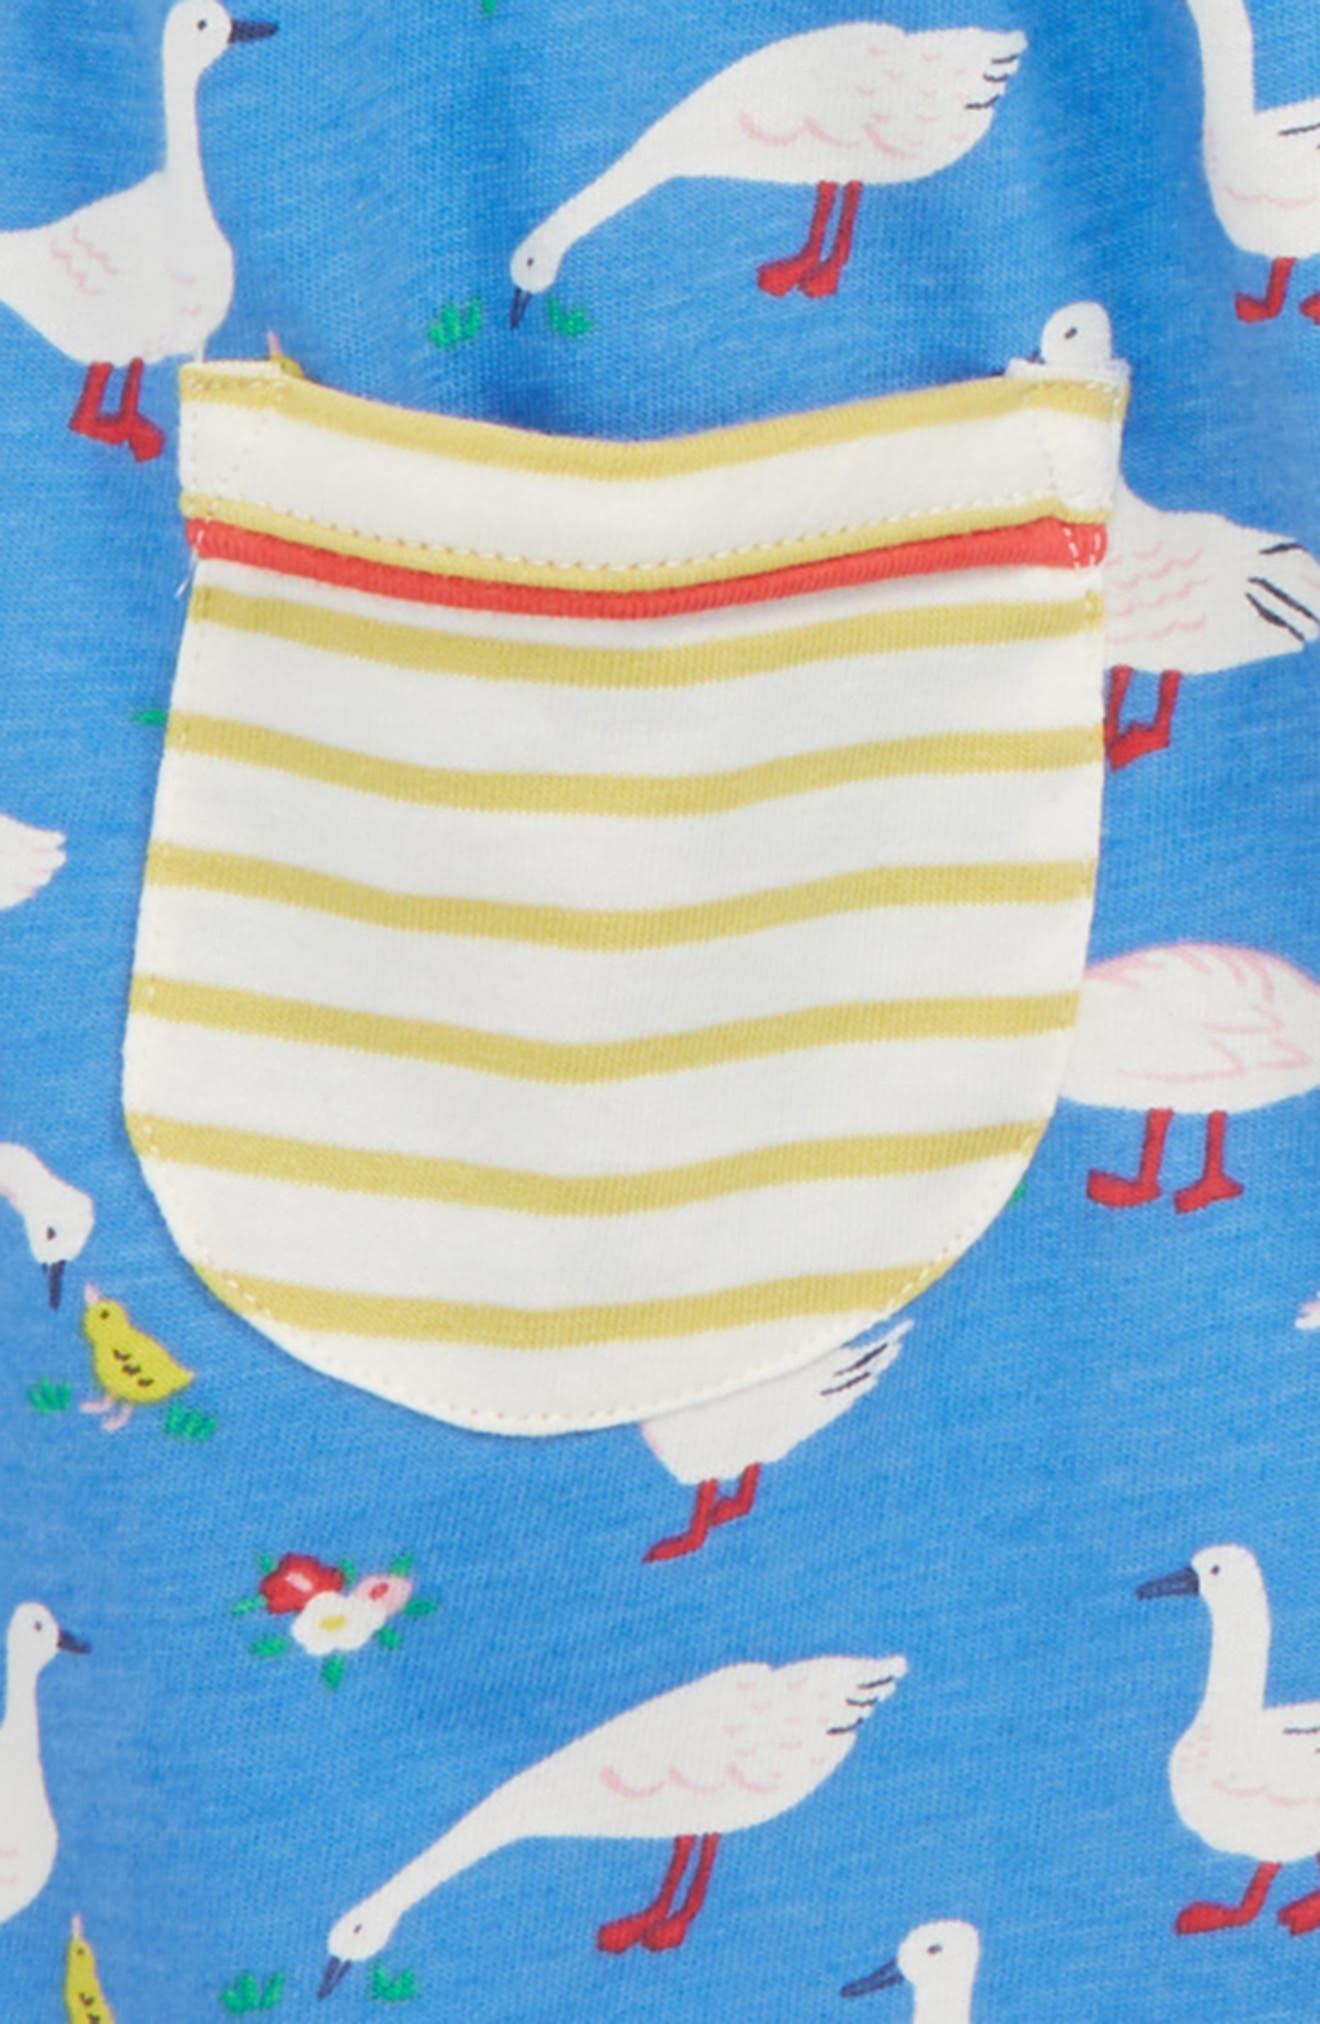 Hotchpotch Jersey Dress,                             Alternate thumbnail 2, color,                             404